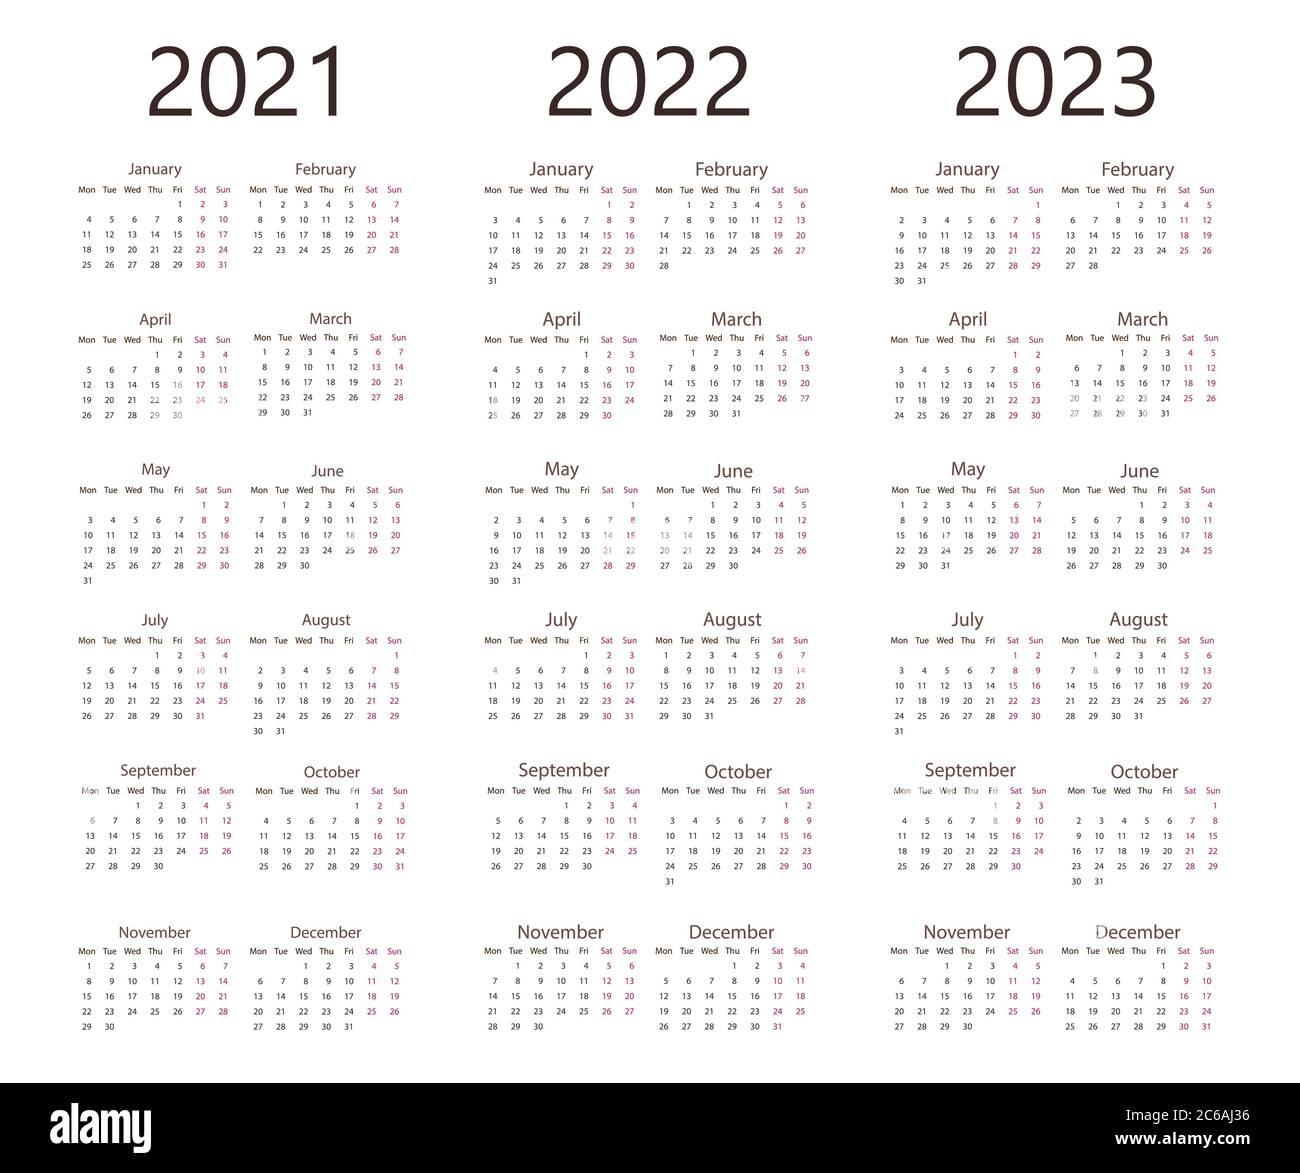 Monthly Calendar 2022 2023.2021 2022 2023 Calendar Week Monday Vector Illustration Flat Design Stock Vector Image Art Alamy